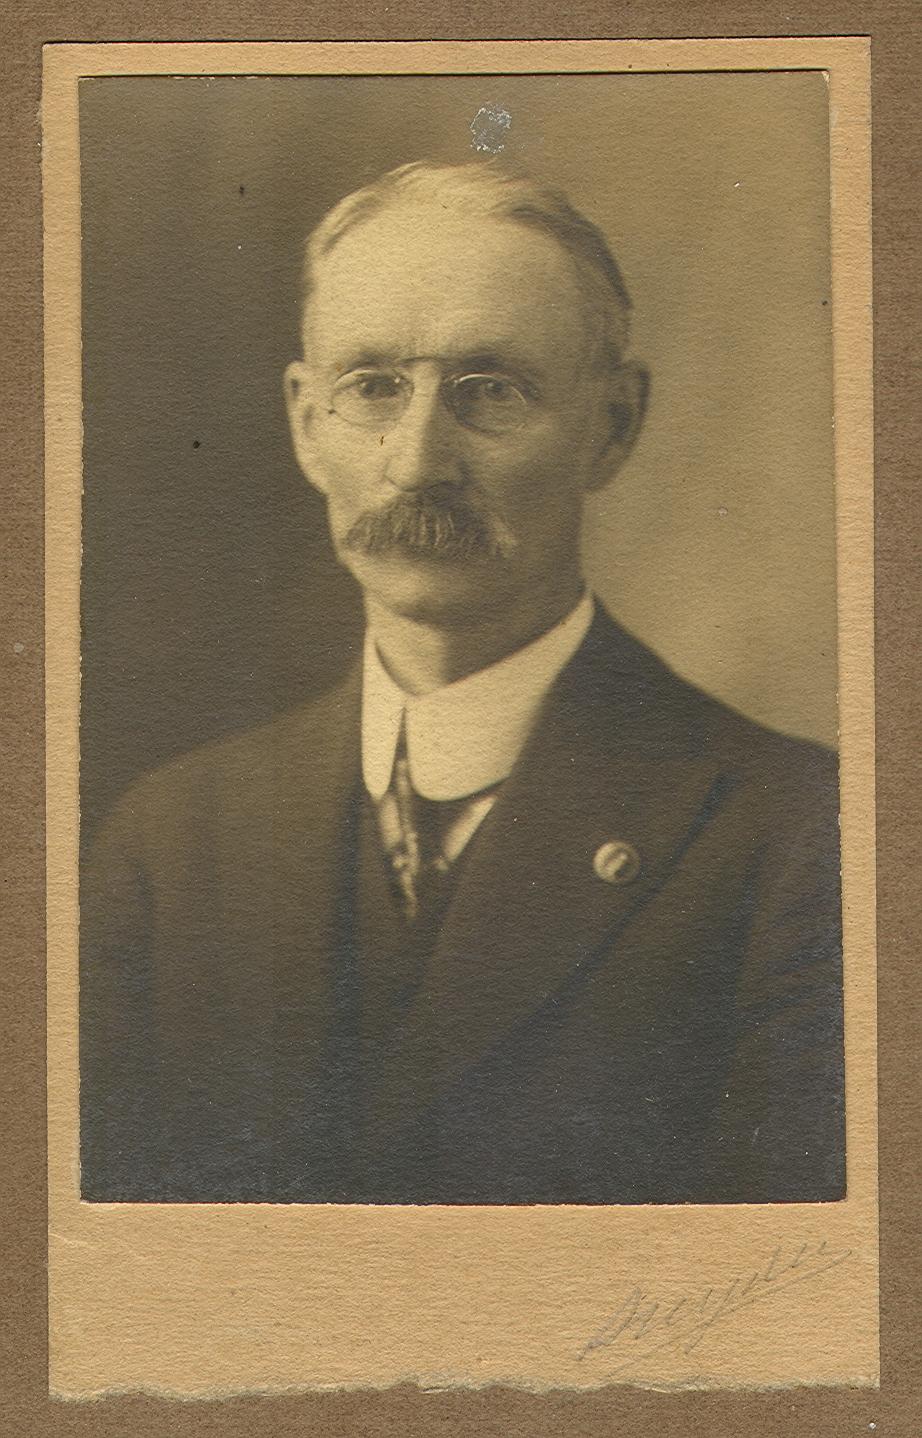 Linton Thomas Latta 001